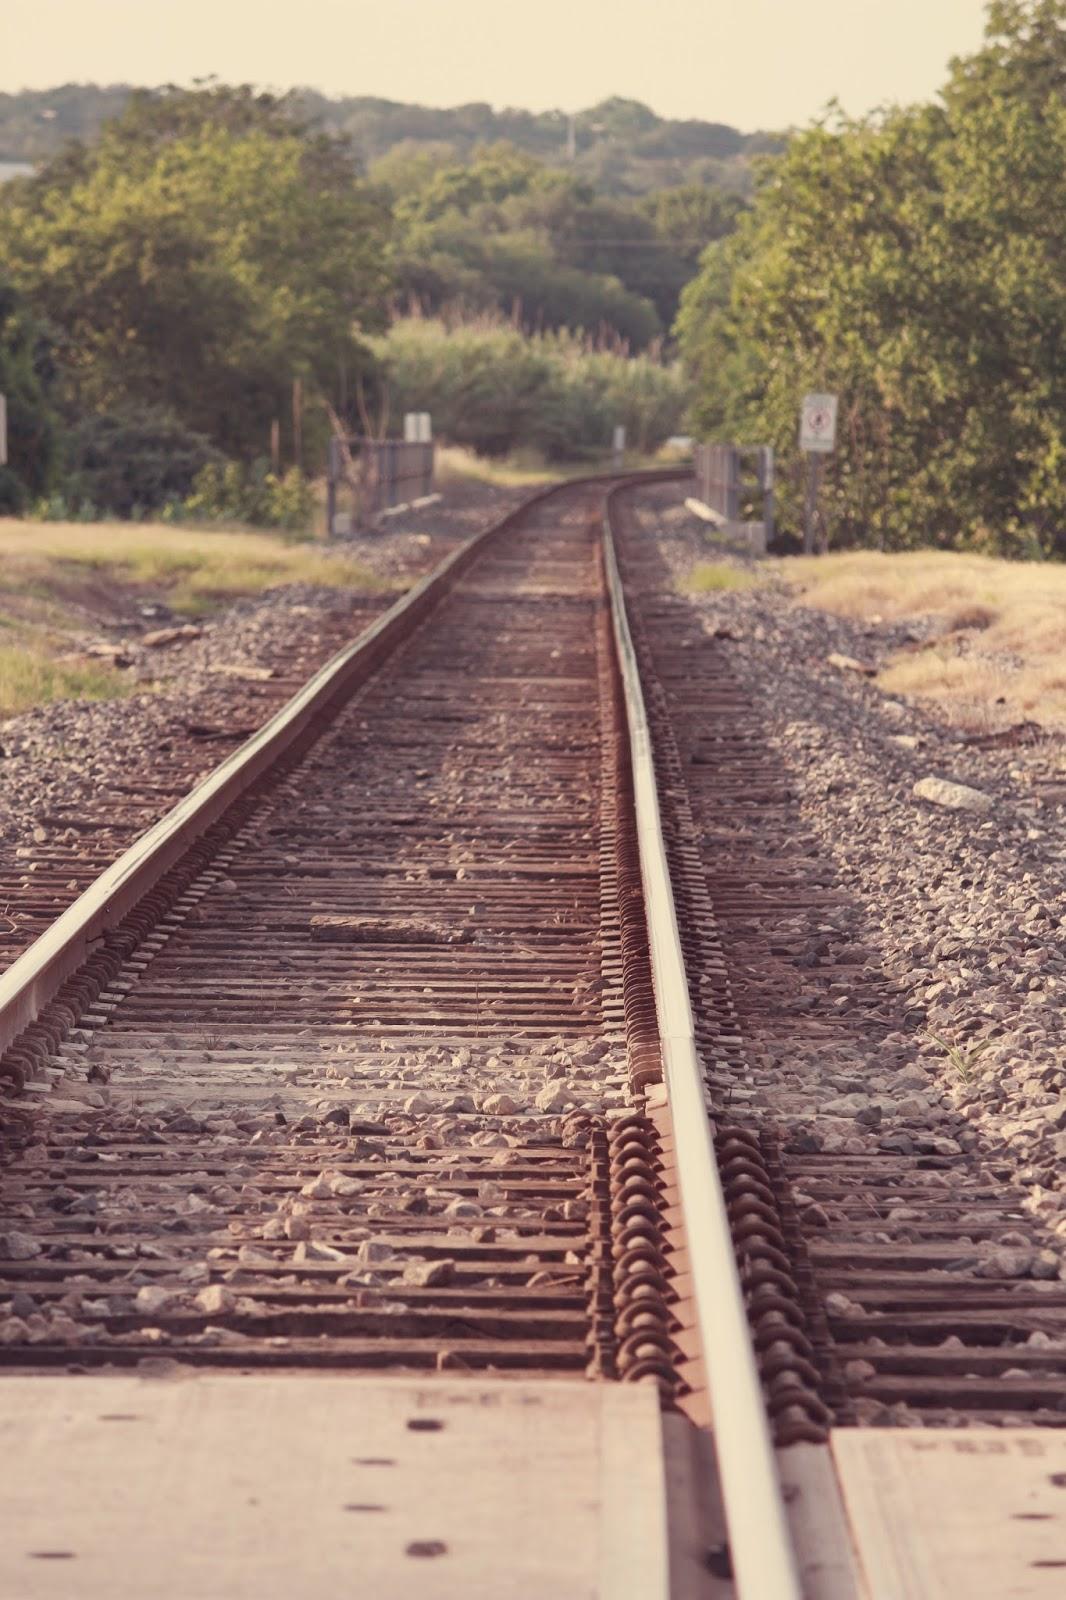 train track headed somewhere